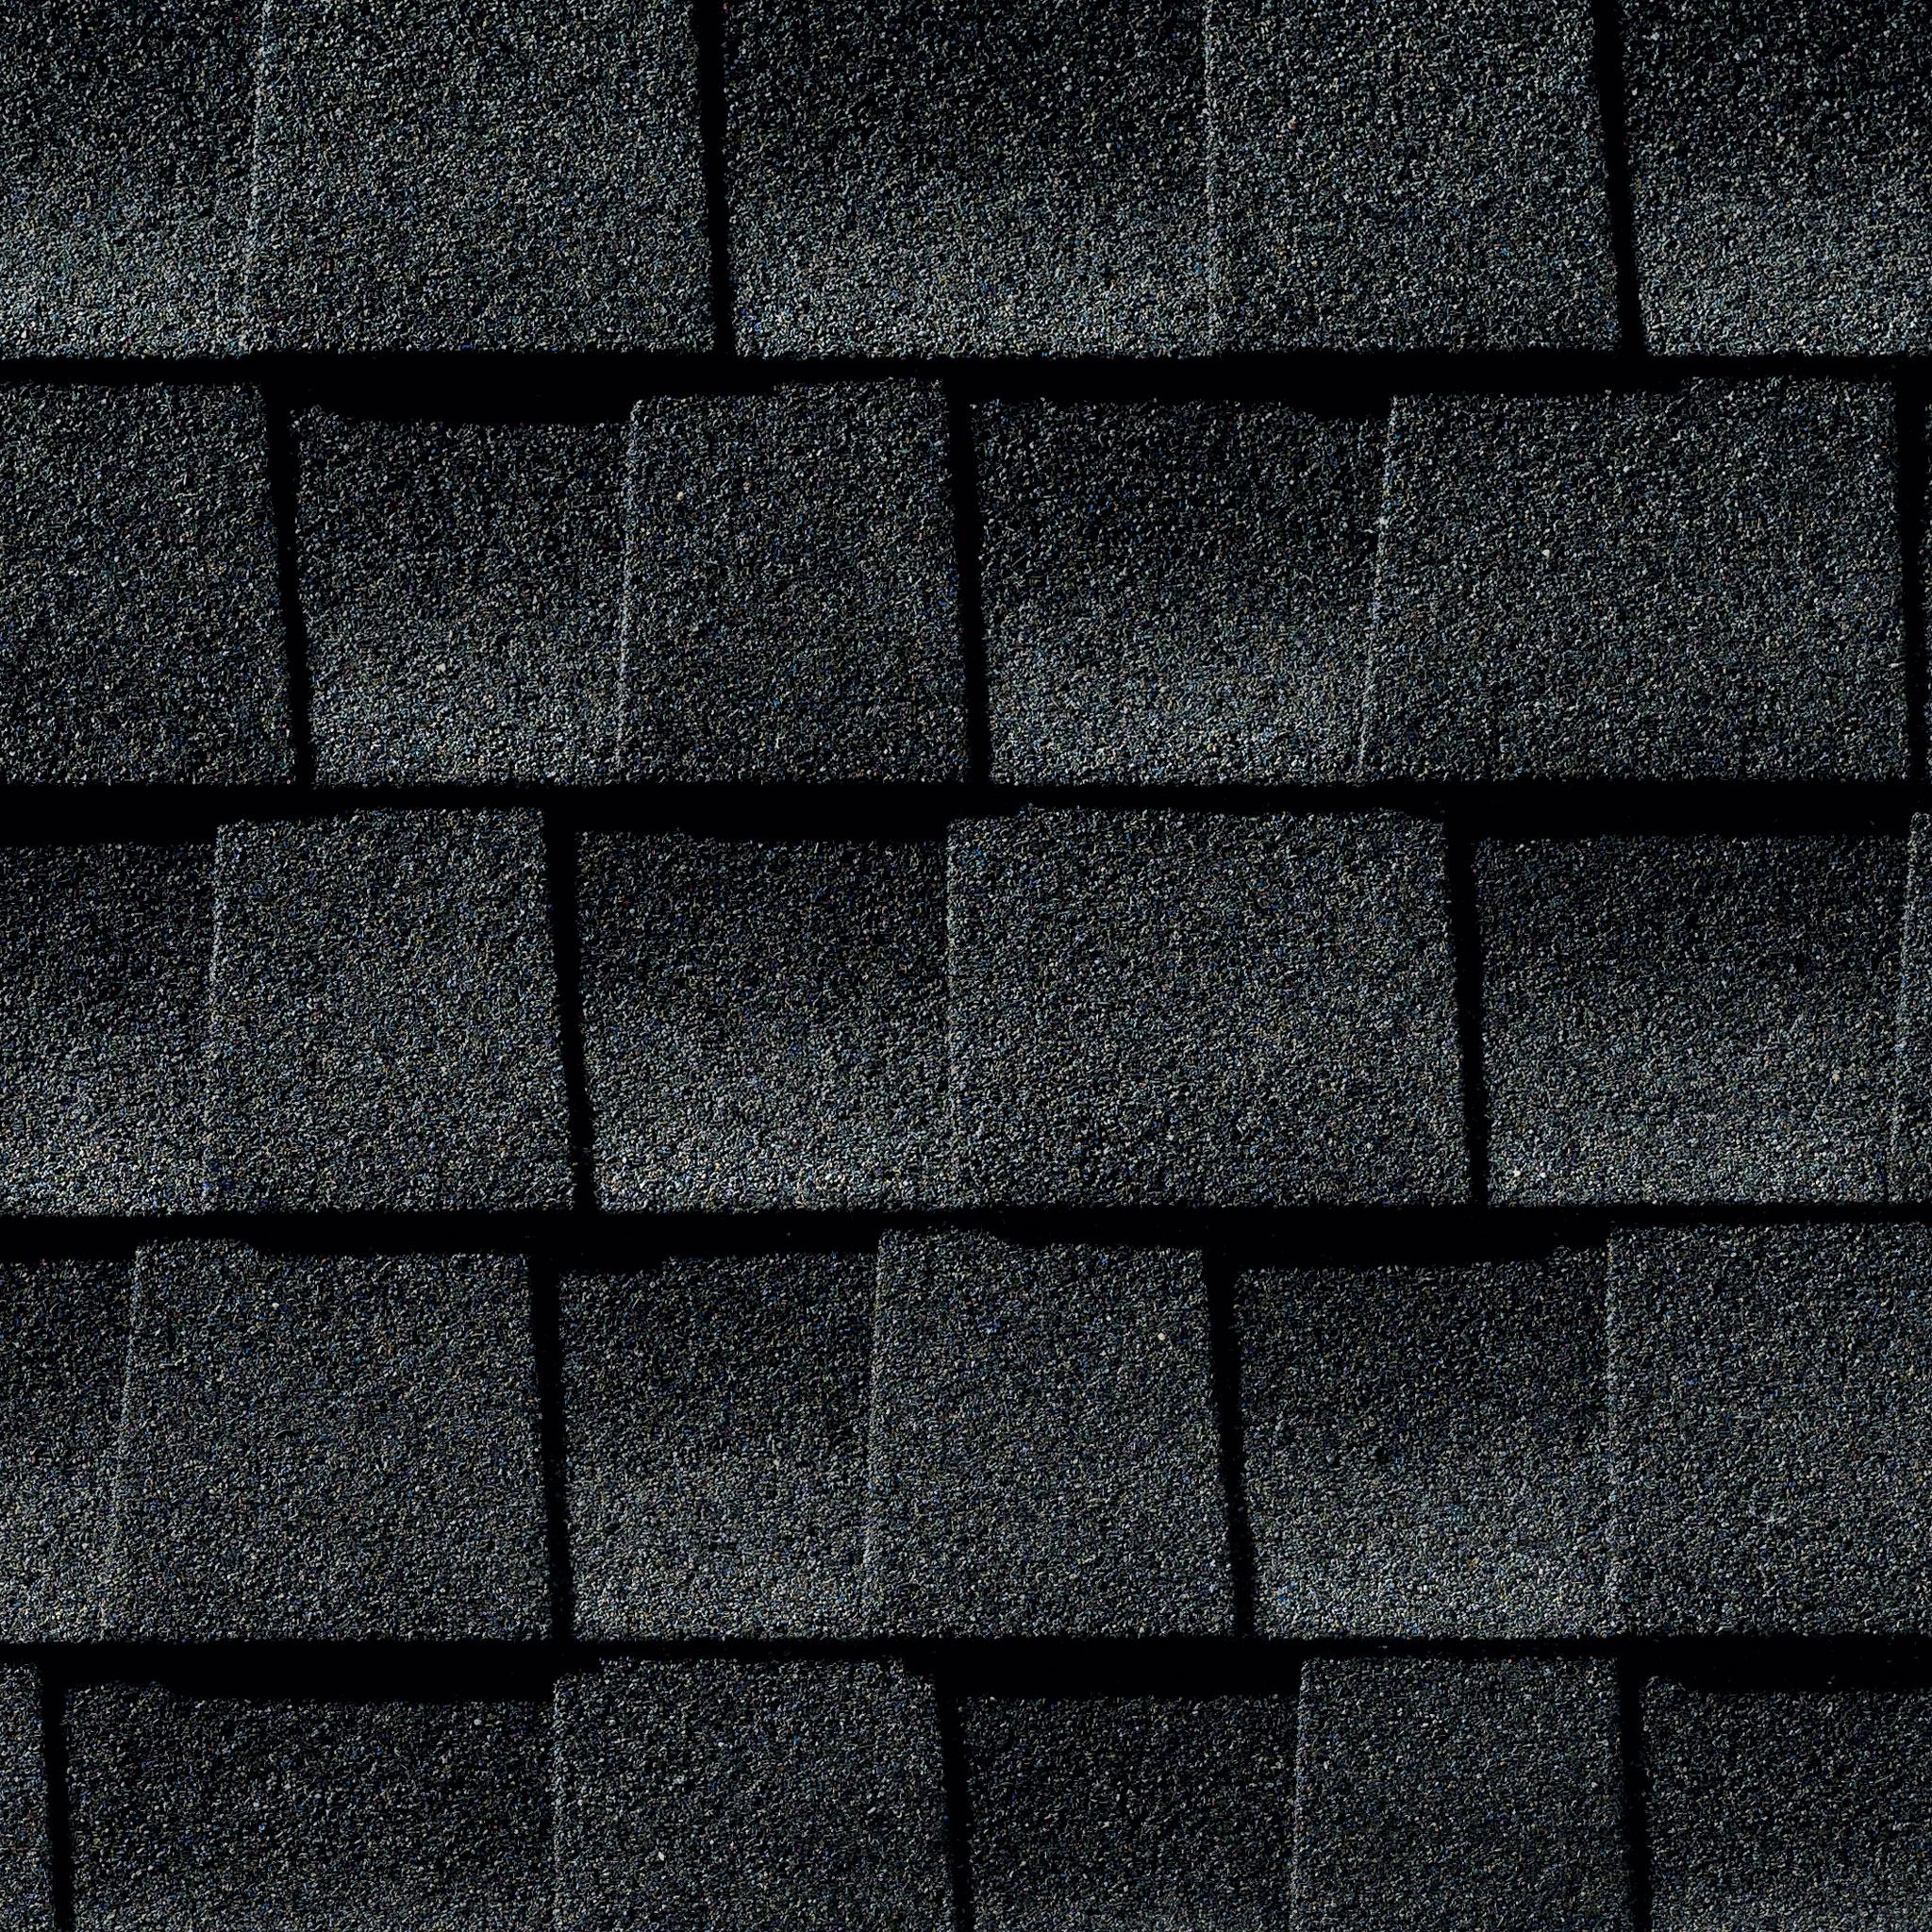 Roofing singles Asphalt shingle - Wikipedia